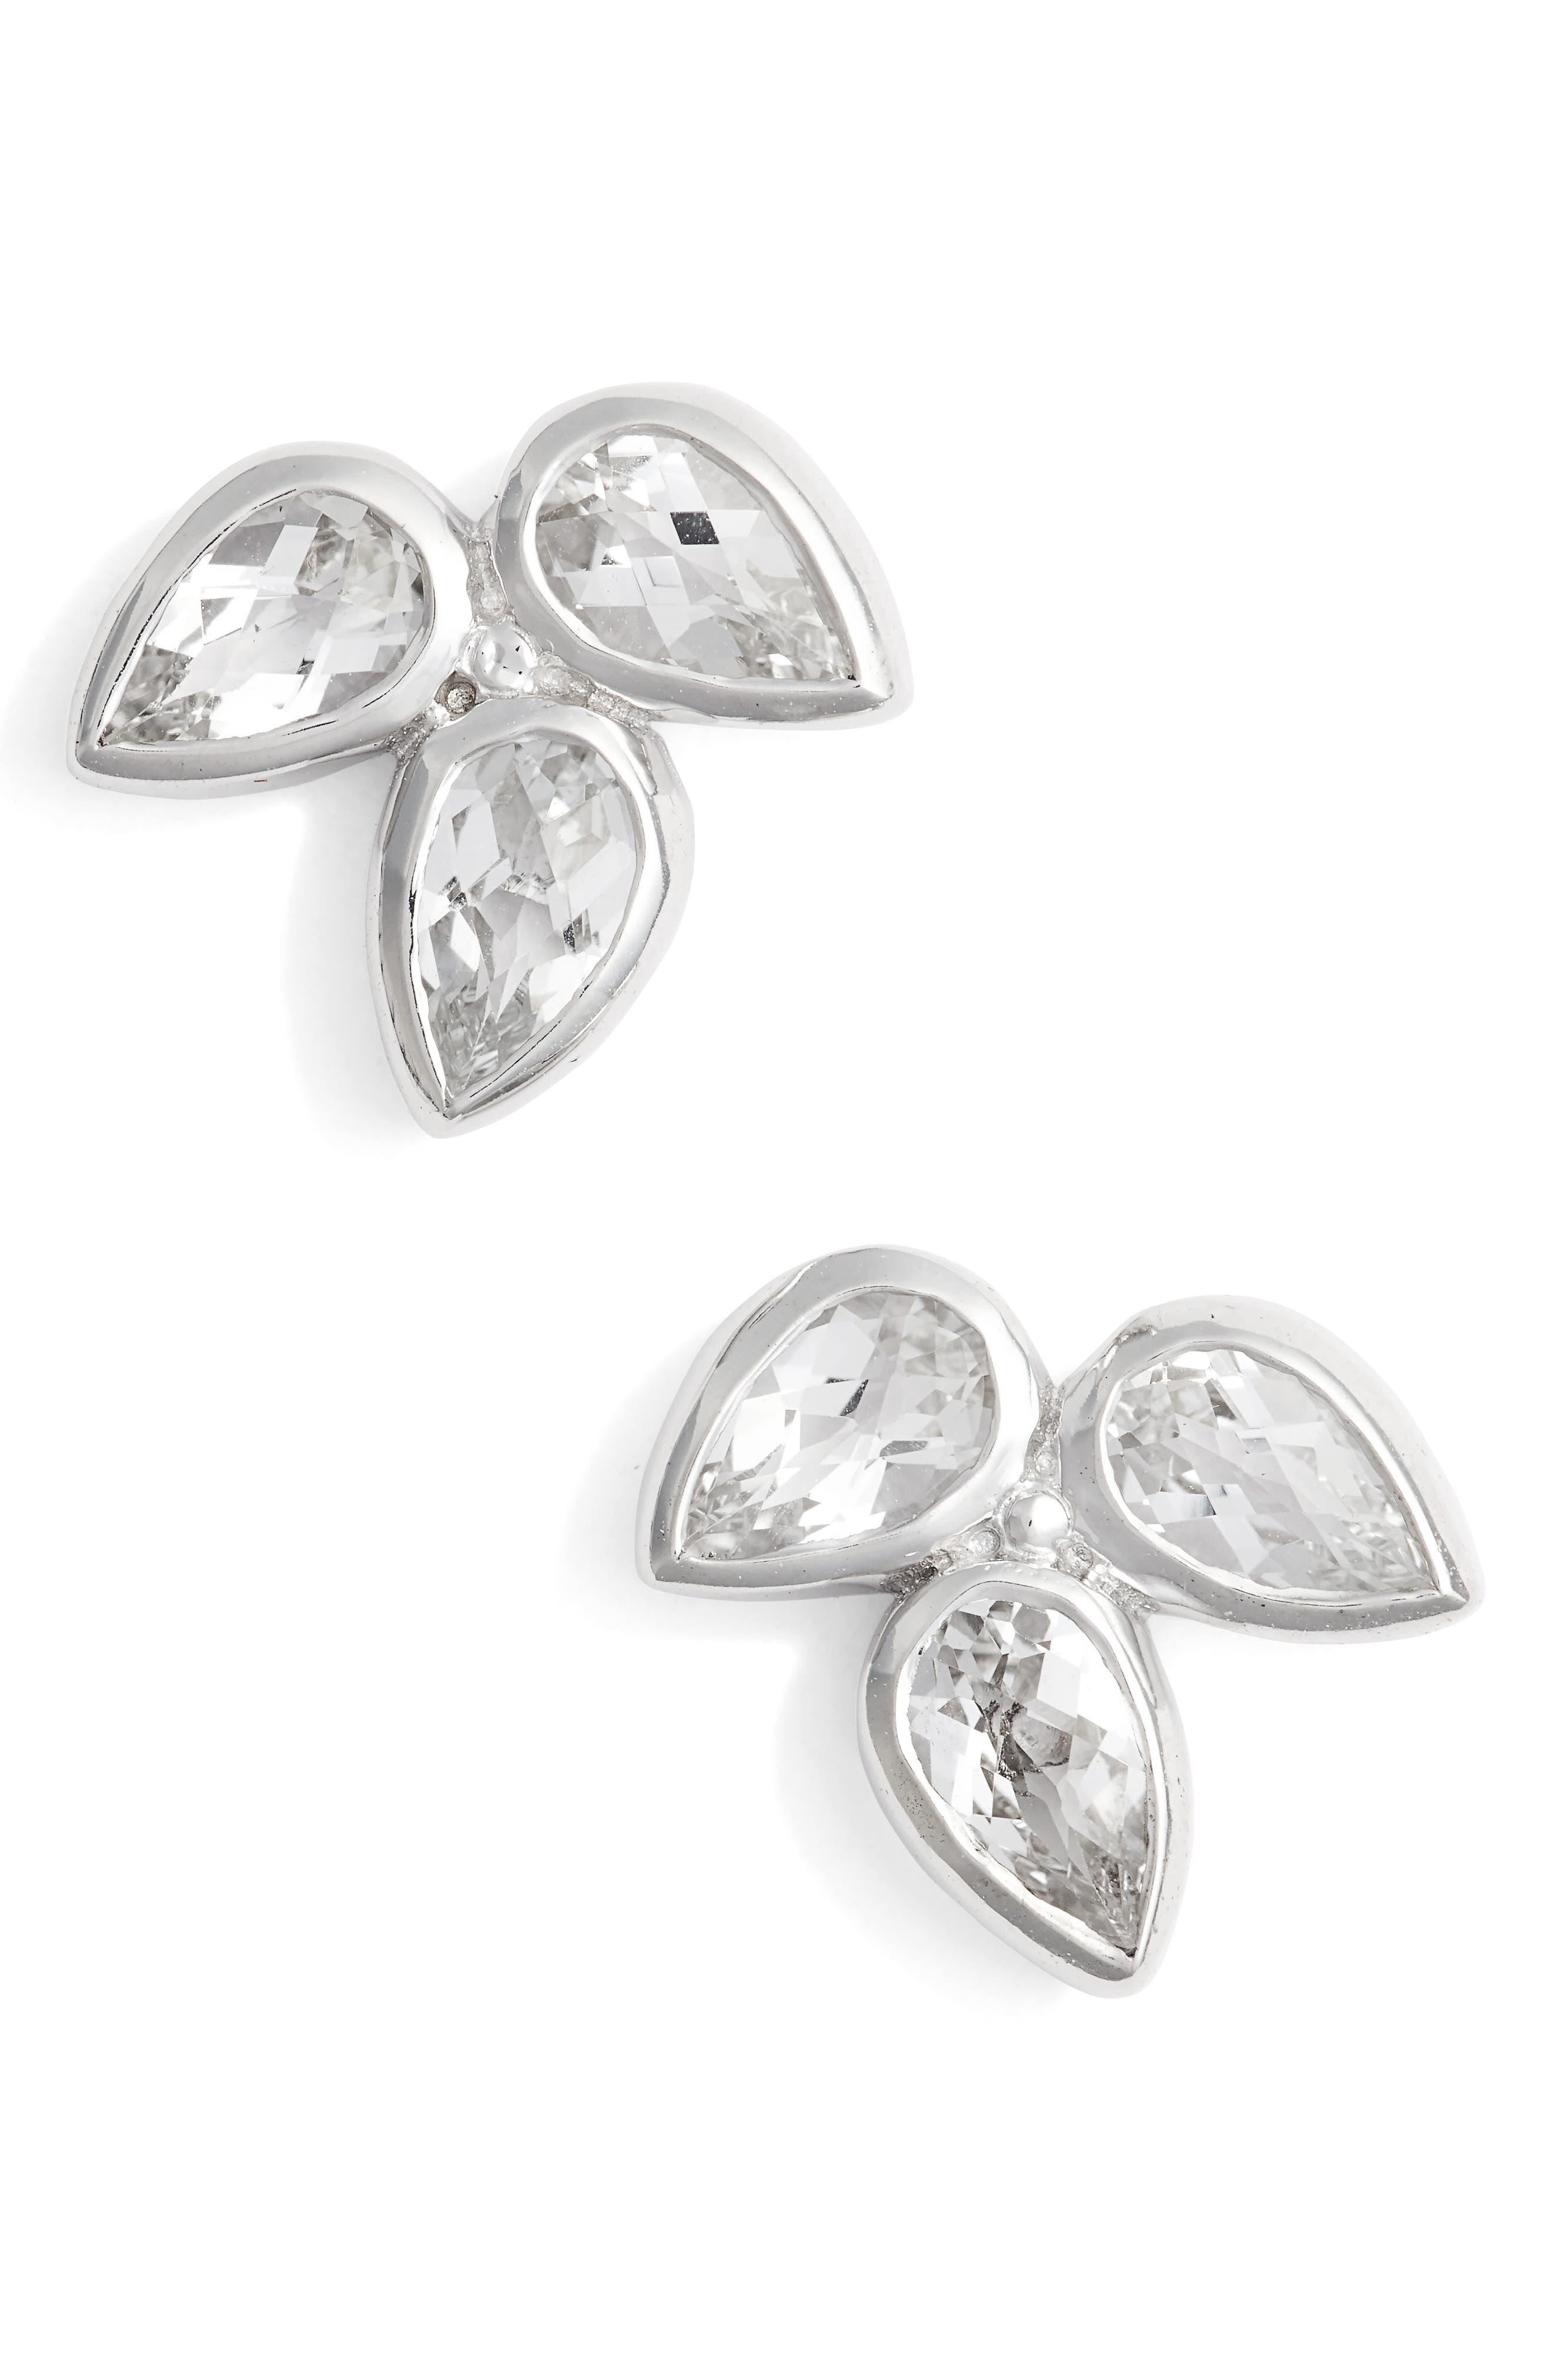 Micro Bouquet White Topaz Post Earrings,                         Main,                         color, WHITE TOPAZ